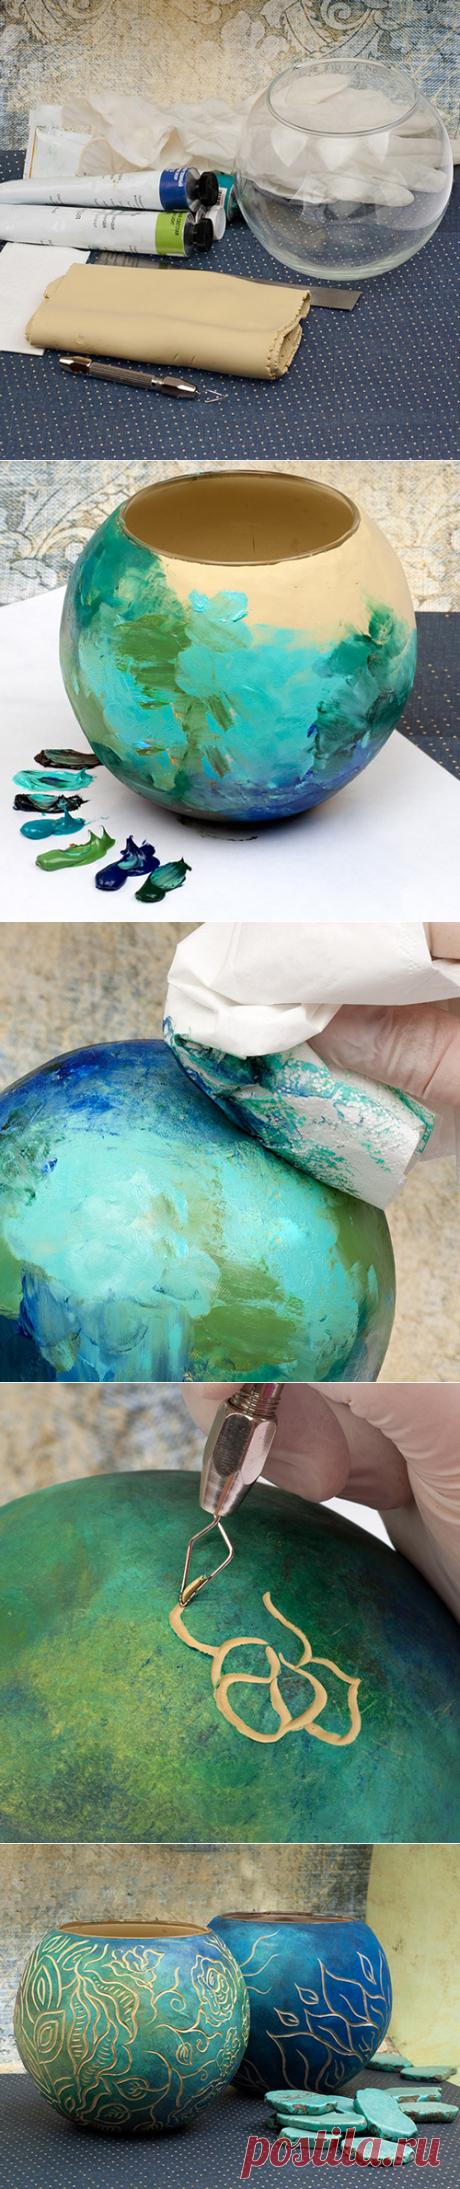 Декоративная ваза в технике сграффито. Идеи для творчества